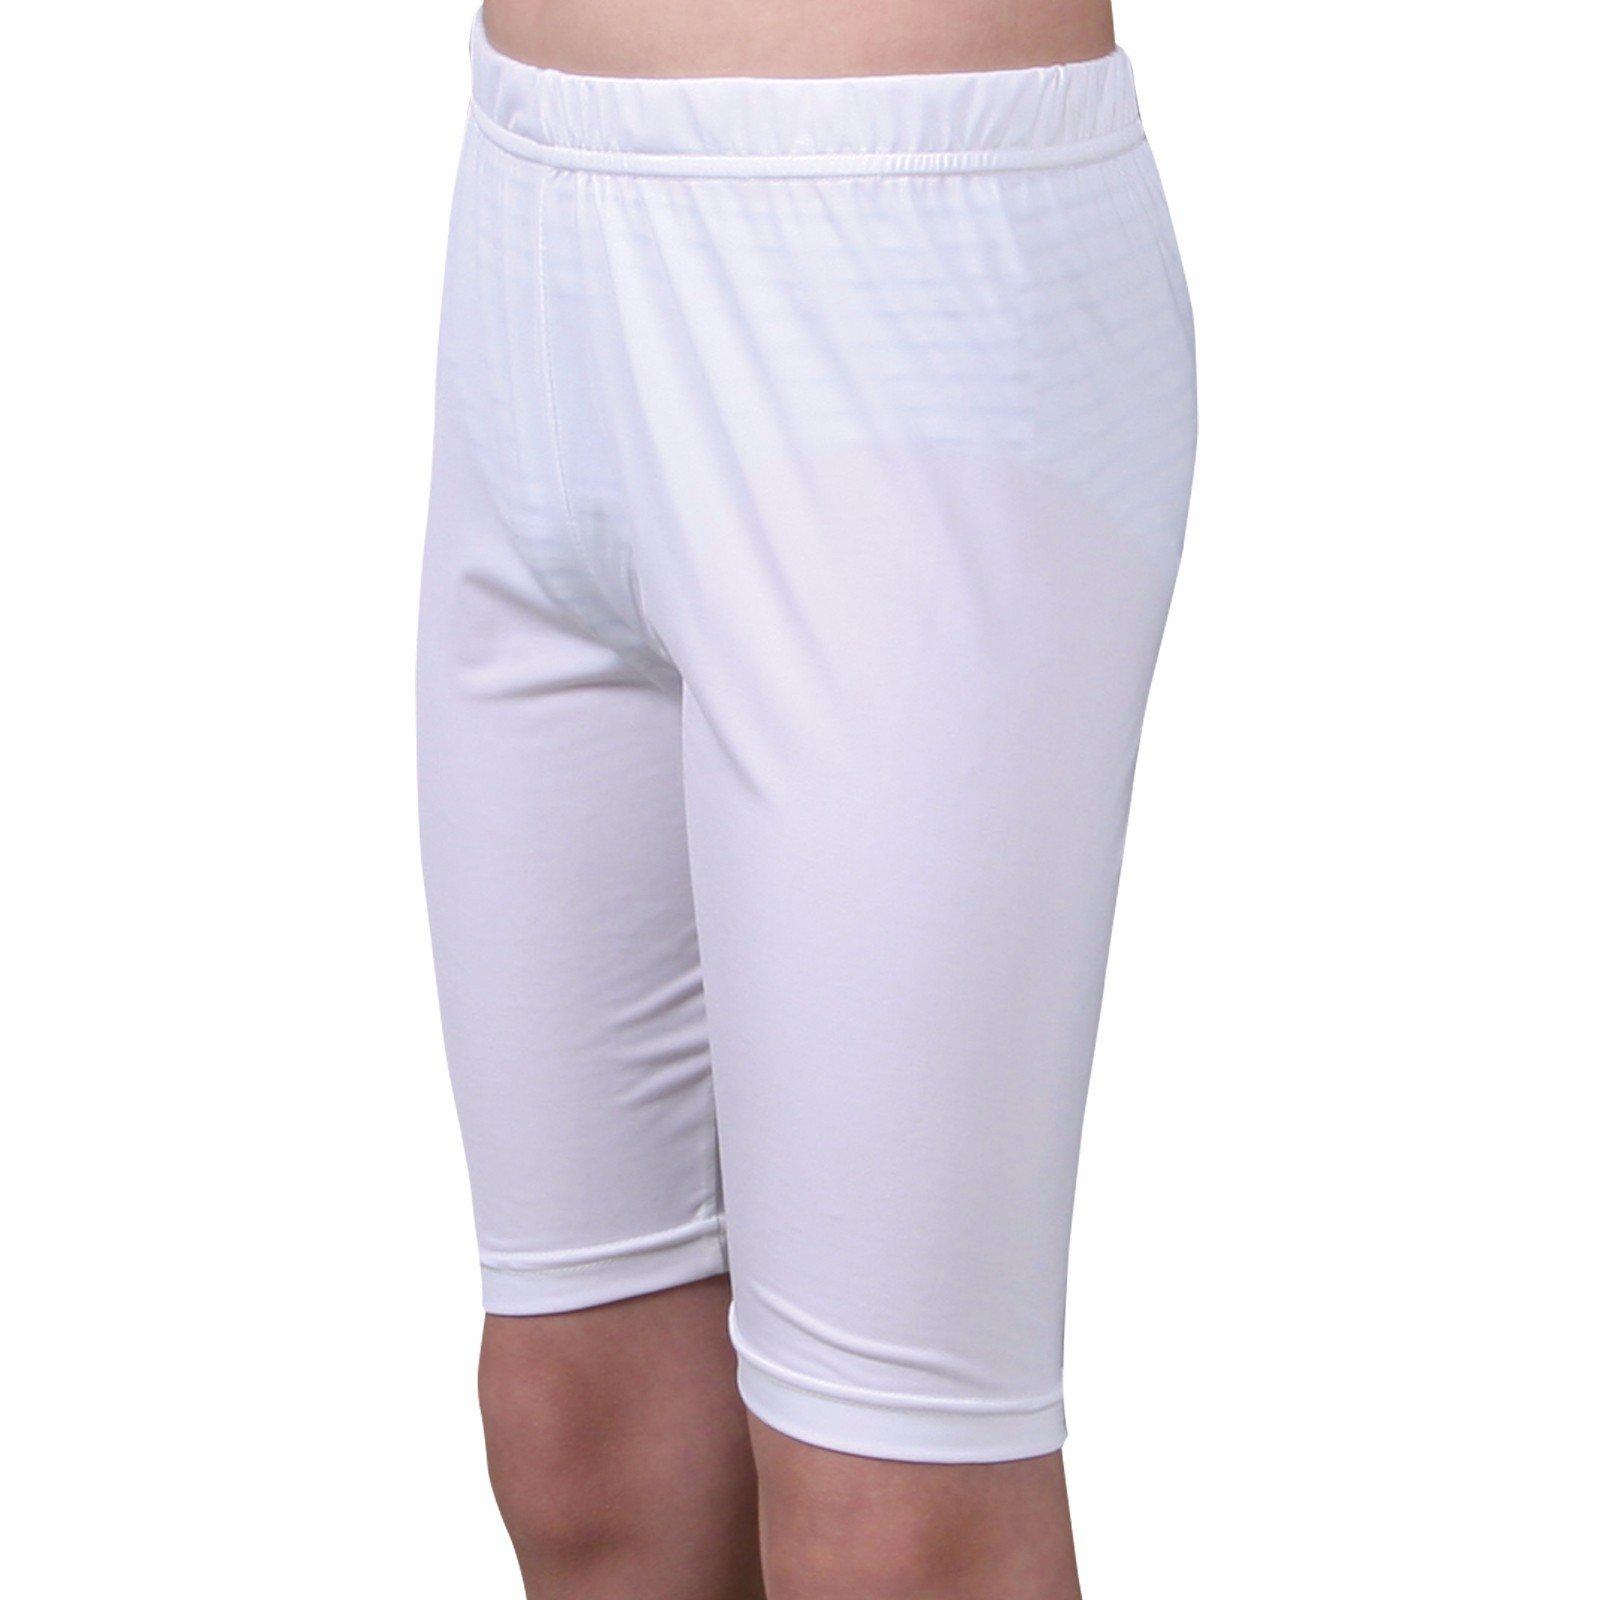 Henri maurice Kids Compression Shorts Underwear Youth Boys Spandex Base Layer Bottom Pants FK